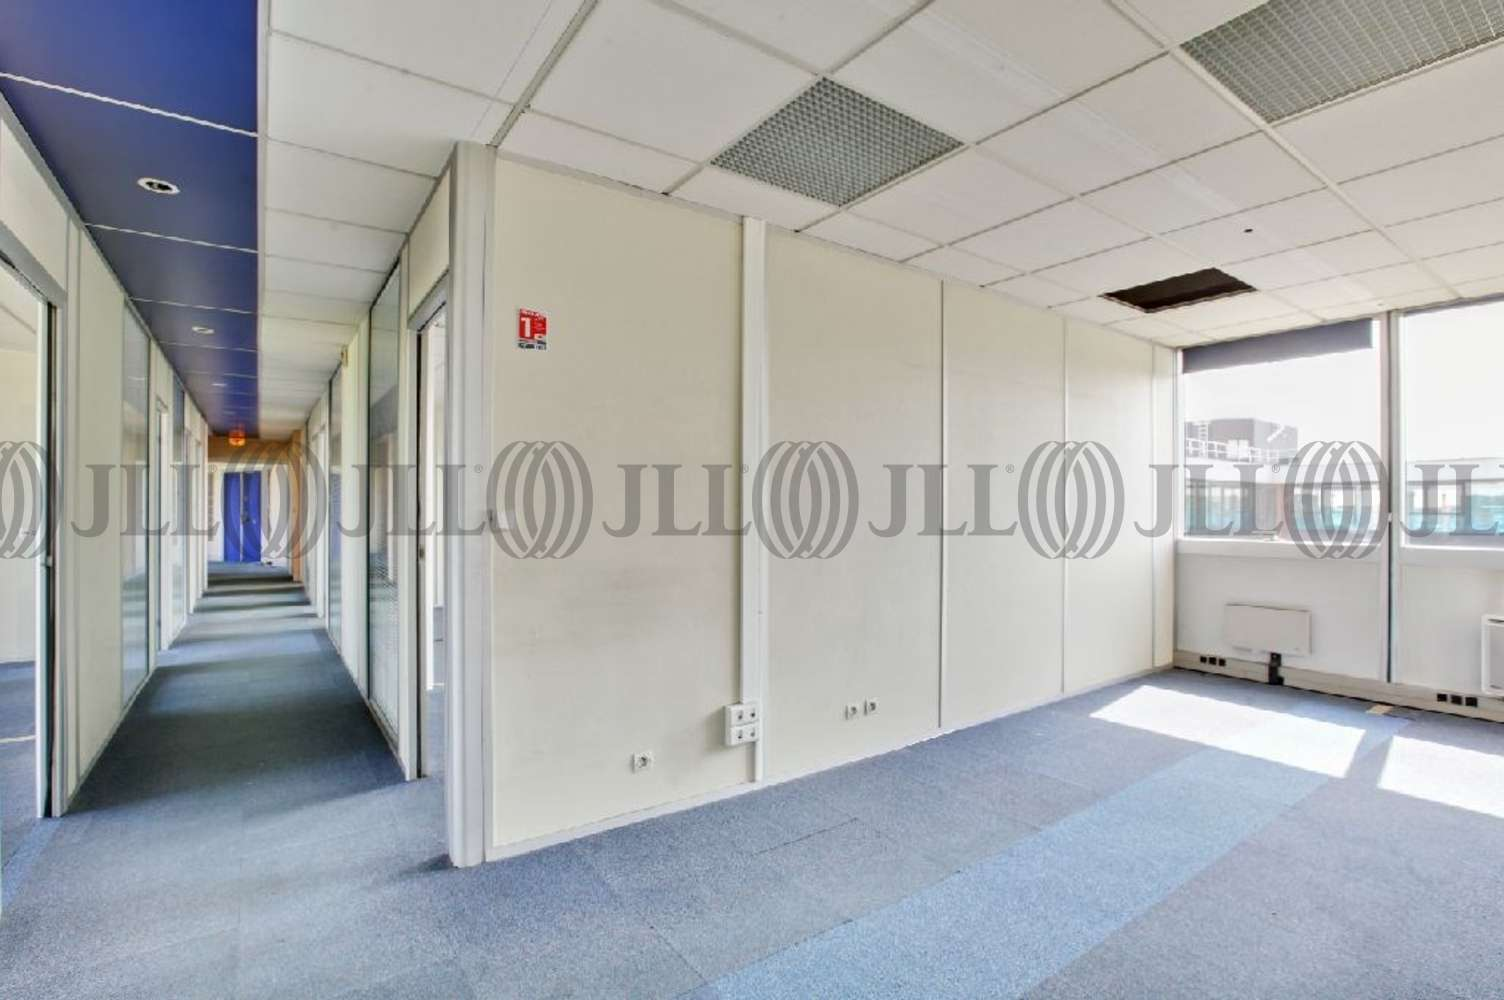 Bureaux Velizy villacoublay, 78140 - NOVALIZY - BATIMENT A